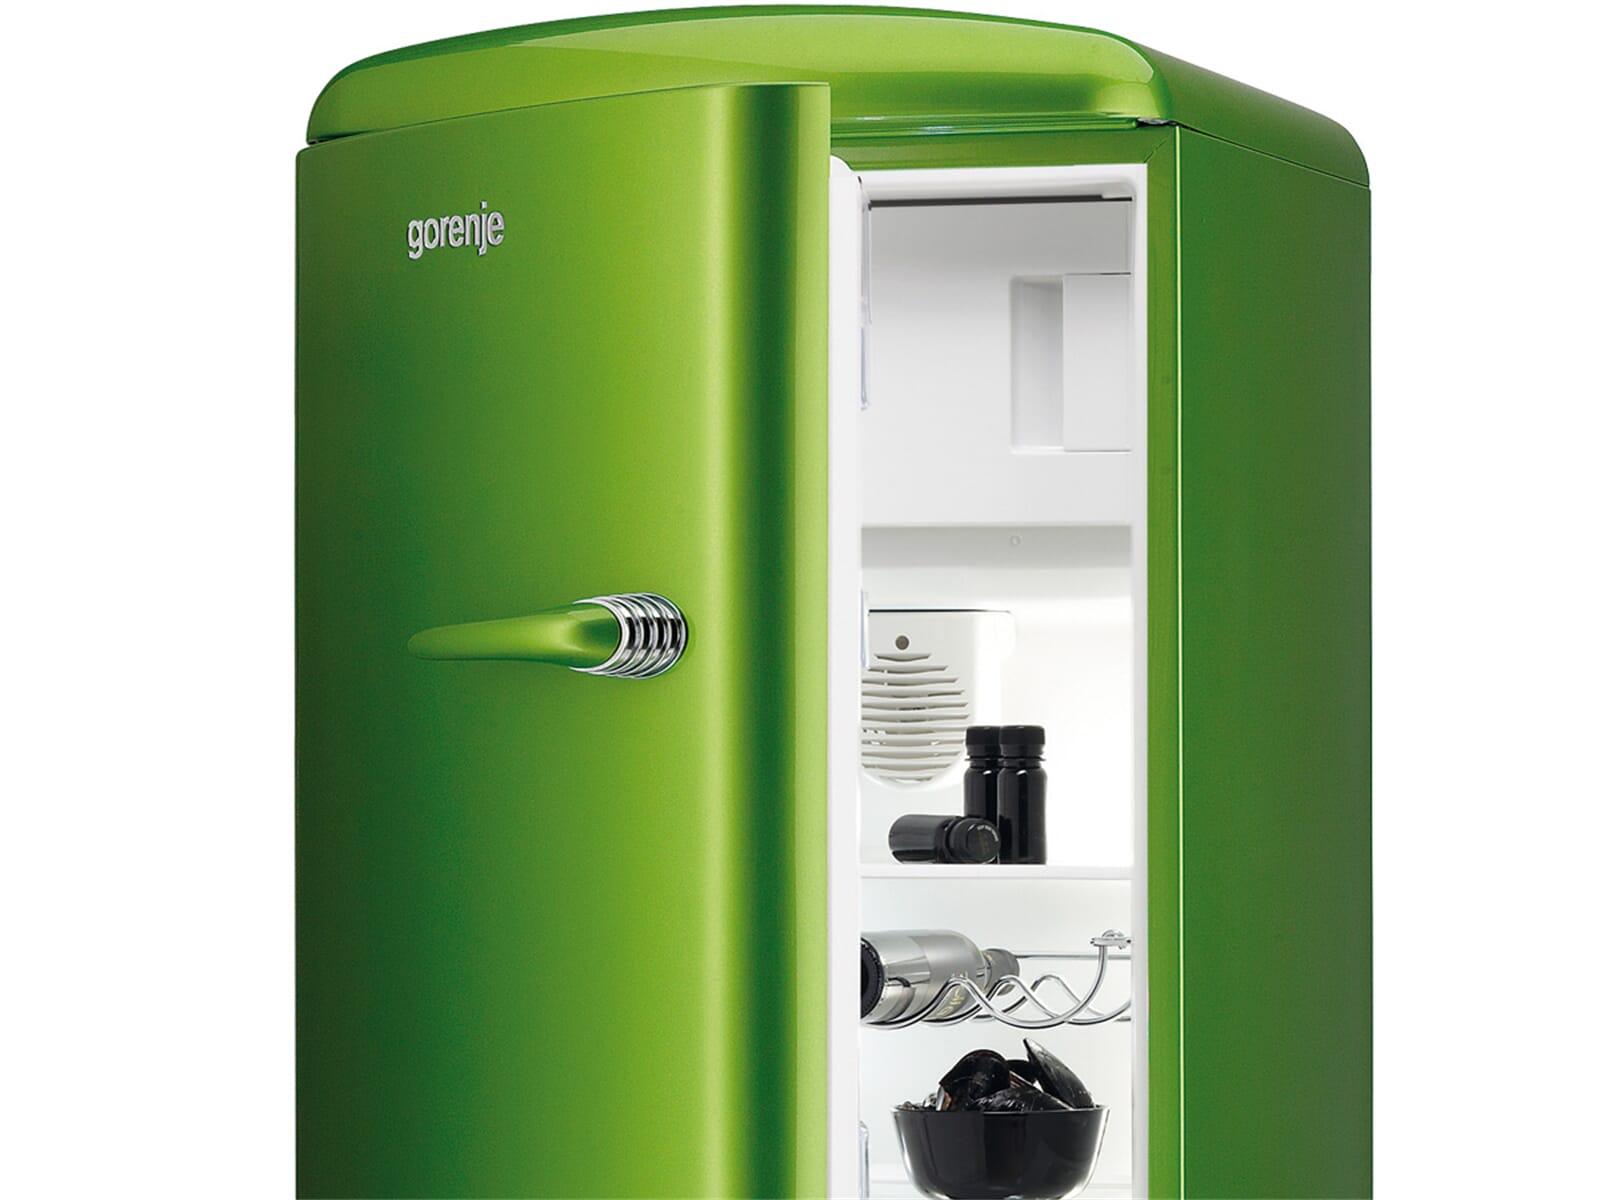 Gorenje Kühlschrank Idealo : Gorenje retro kühlschrank idealo gorenje rk oc ab